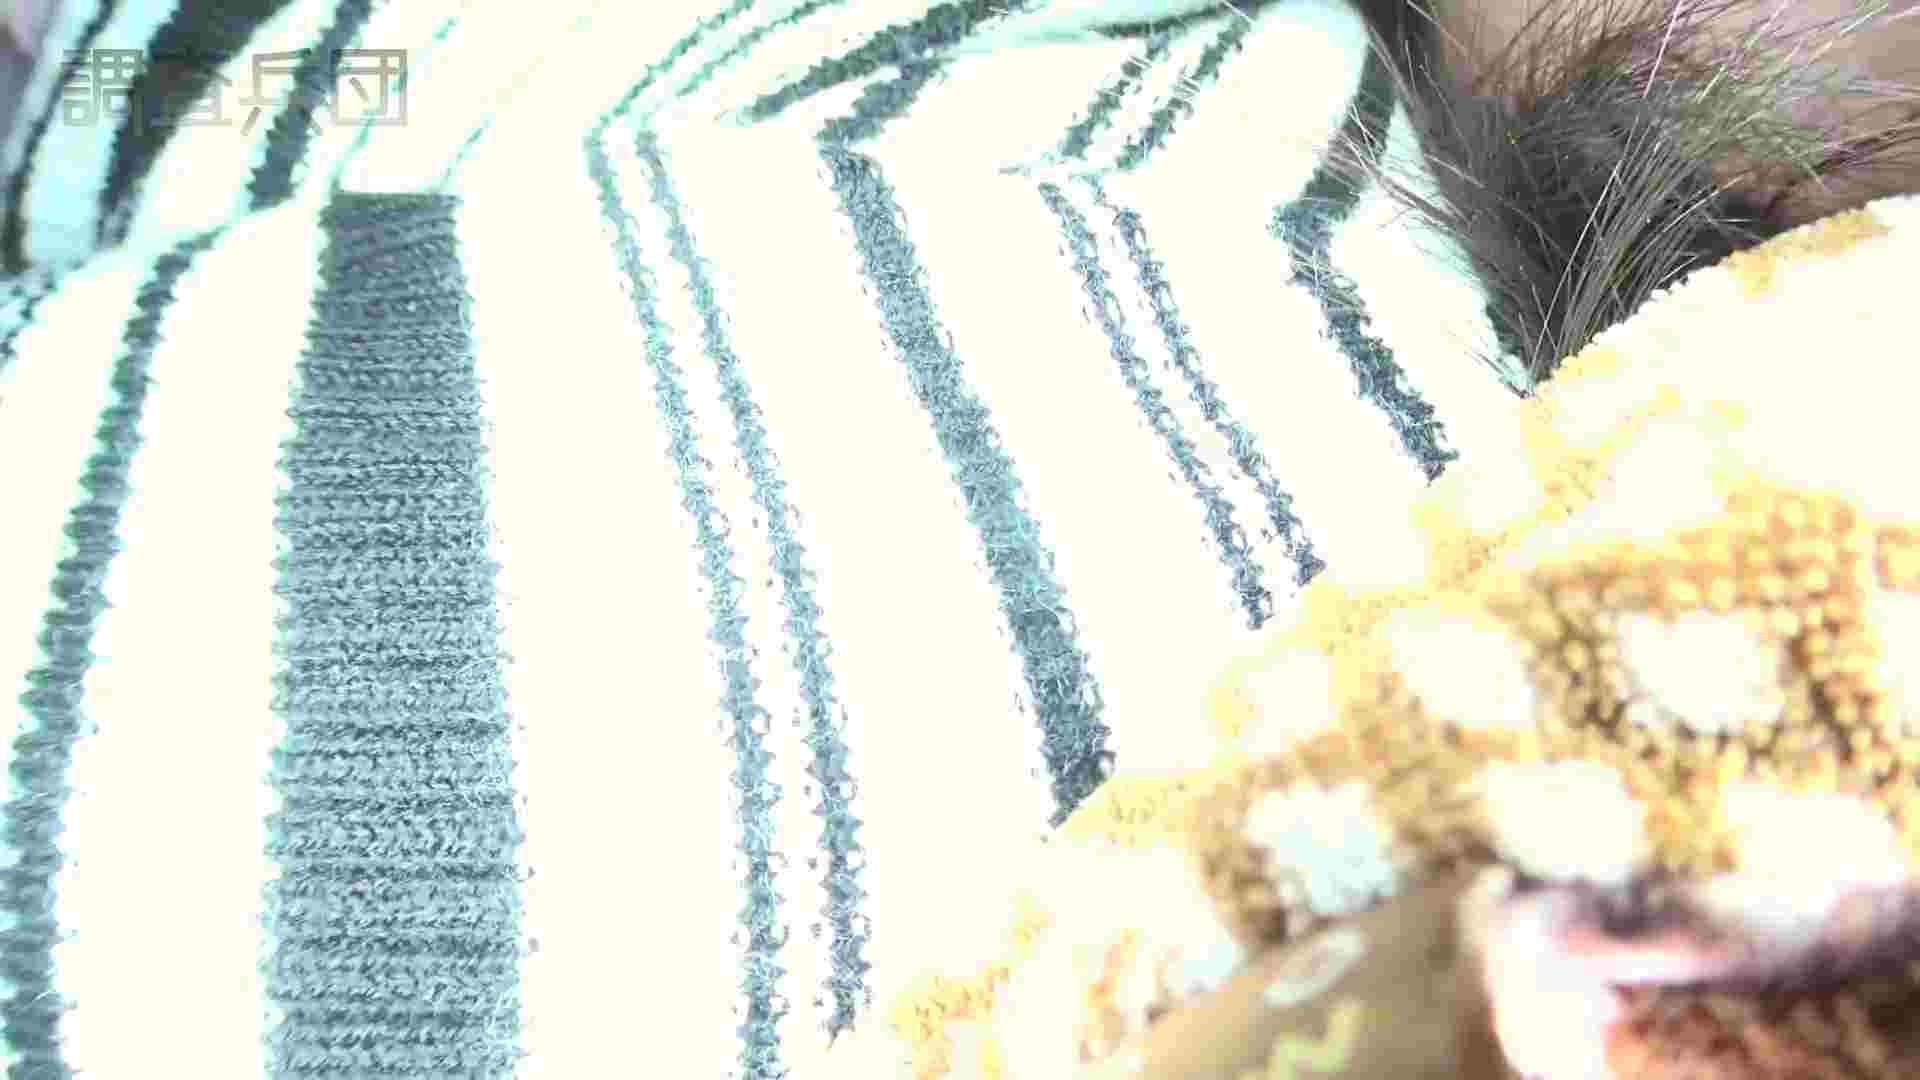 RE:~反撃の悪戯~vol.9 帰国子女の才女・みほ【前編】 高画質動画 エロ画像 29画像 25